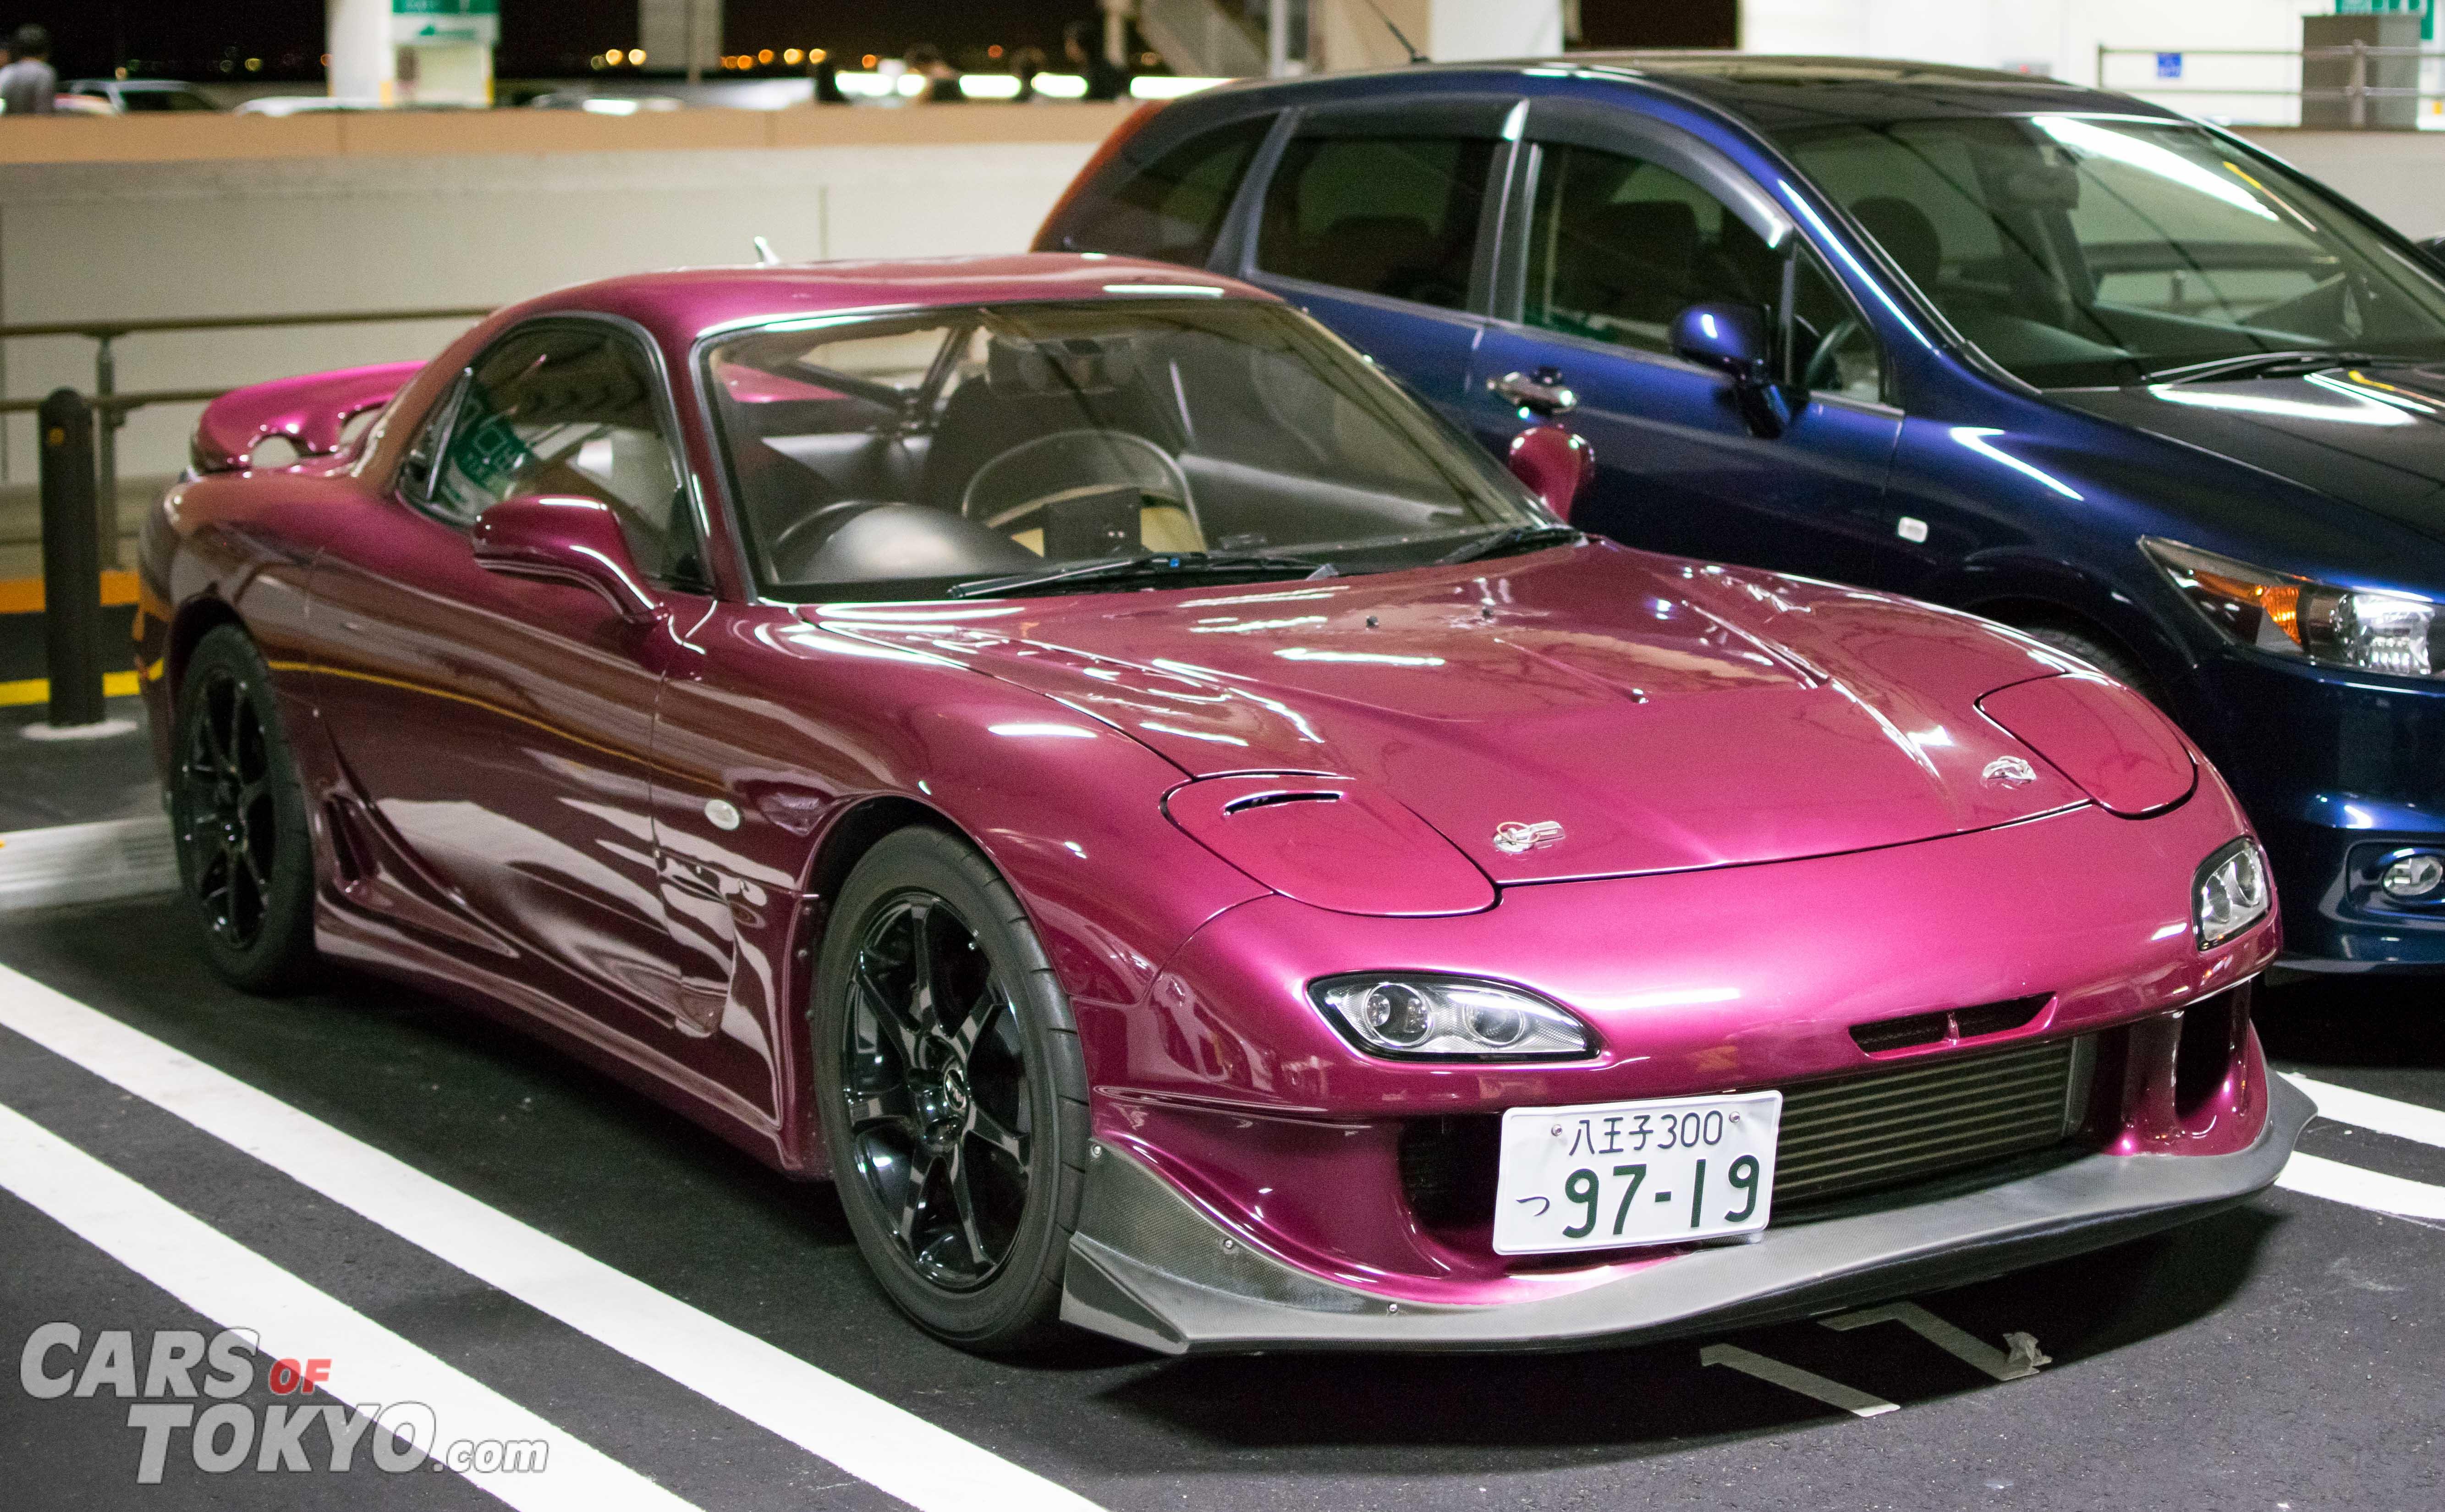 Cars of Tokyo Mazda RX7 Purple